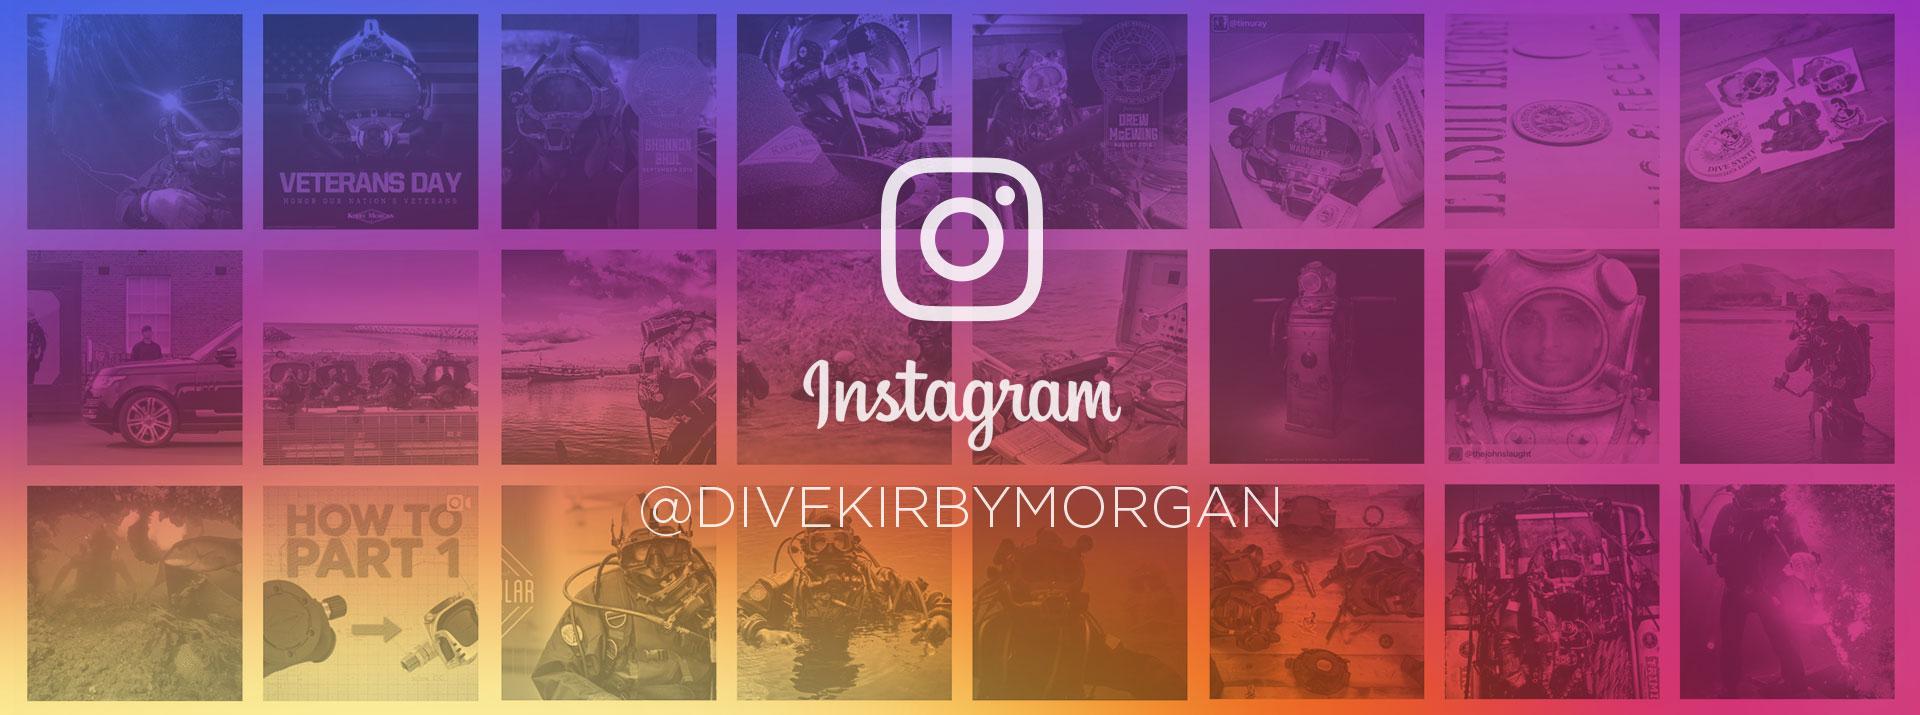 Kirby Morgan Instagram